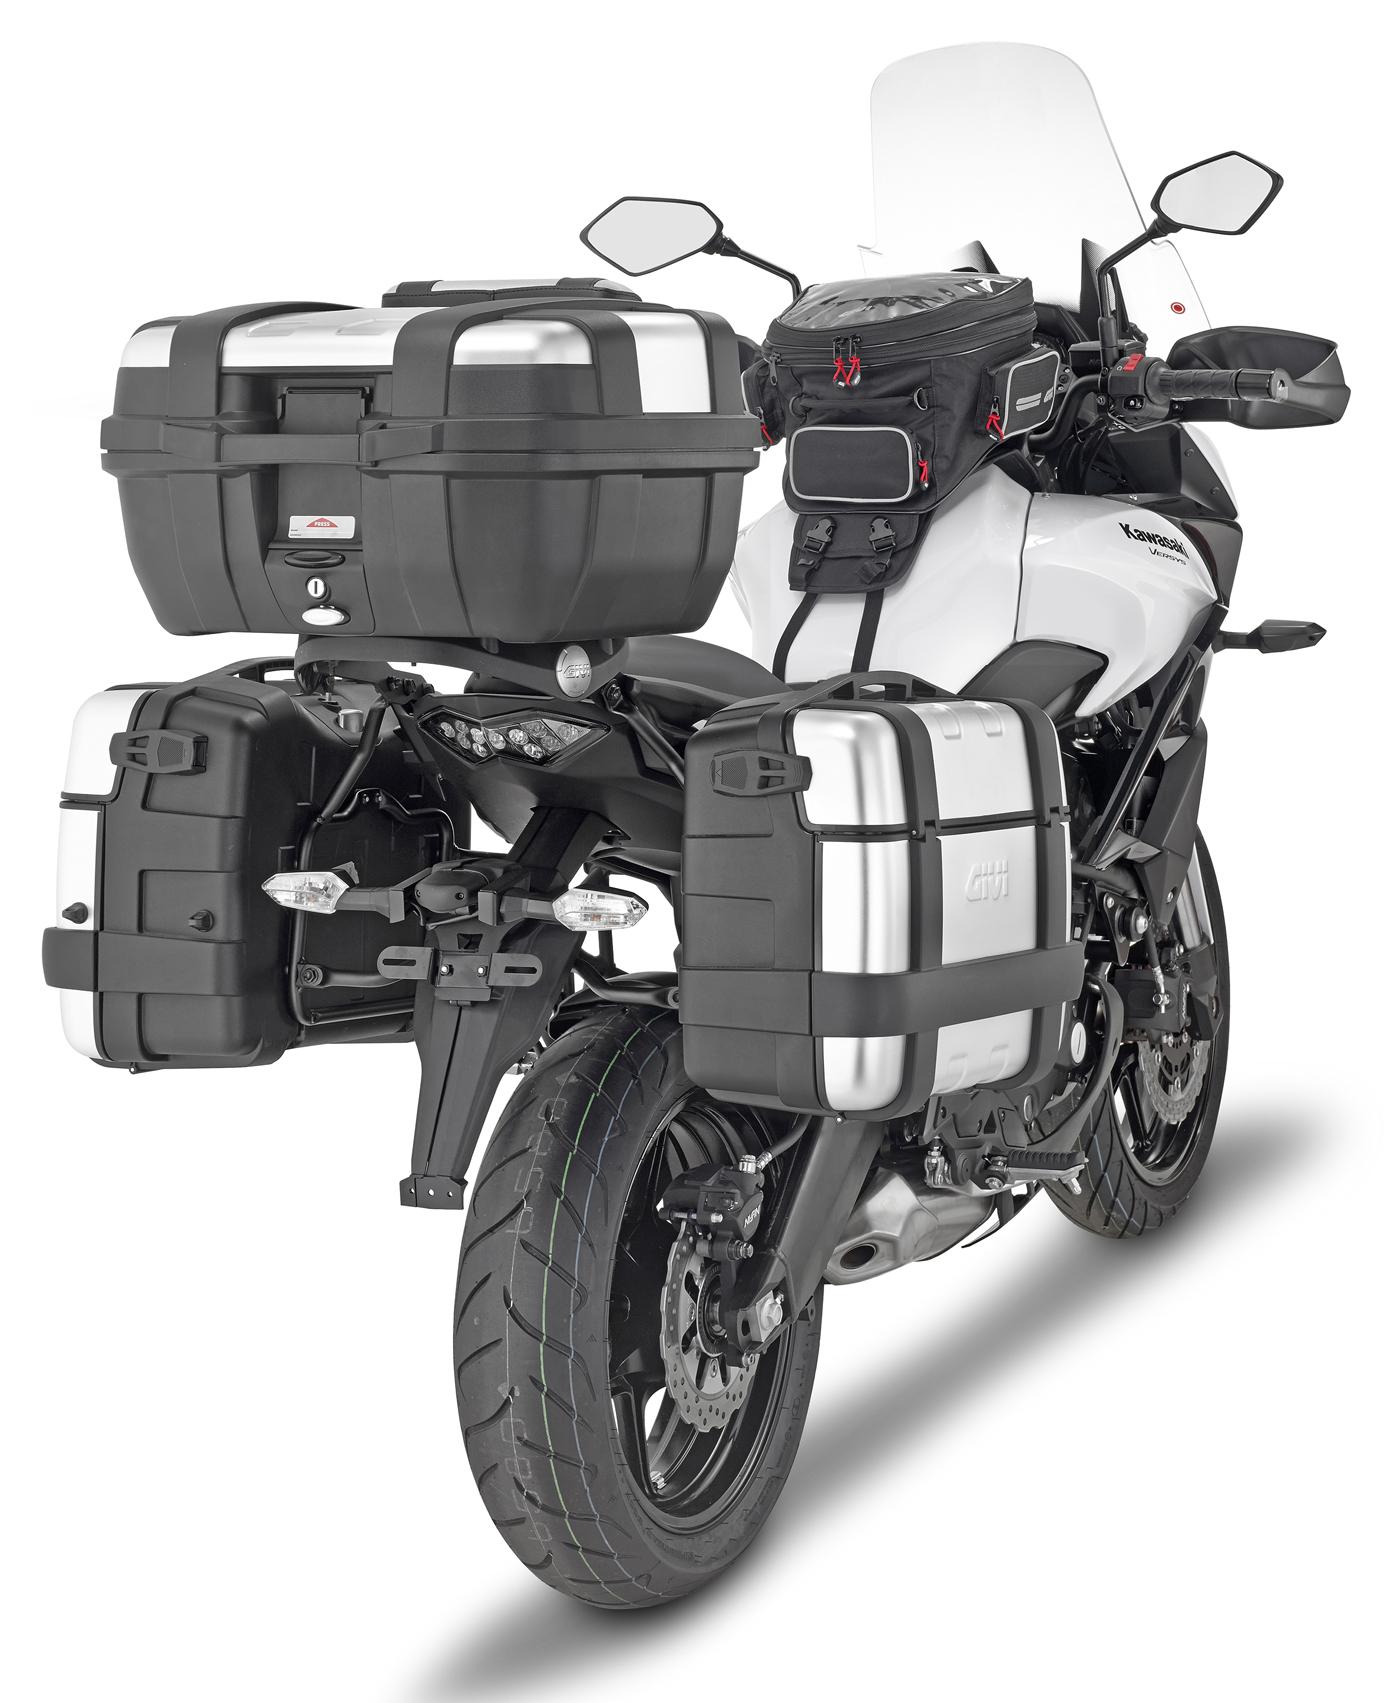 Givi TRK46N Trekker Monokey 46 Litre Motorcycle Top Box Pannier UK stock